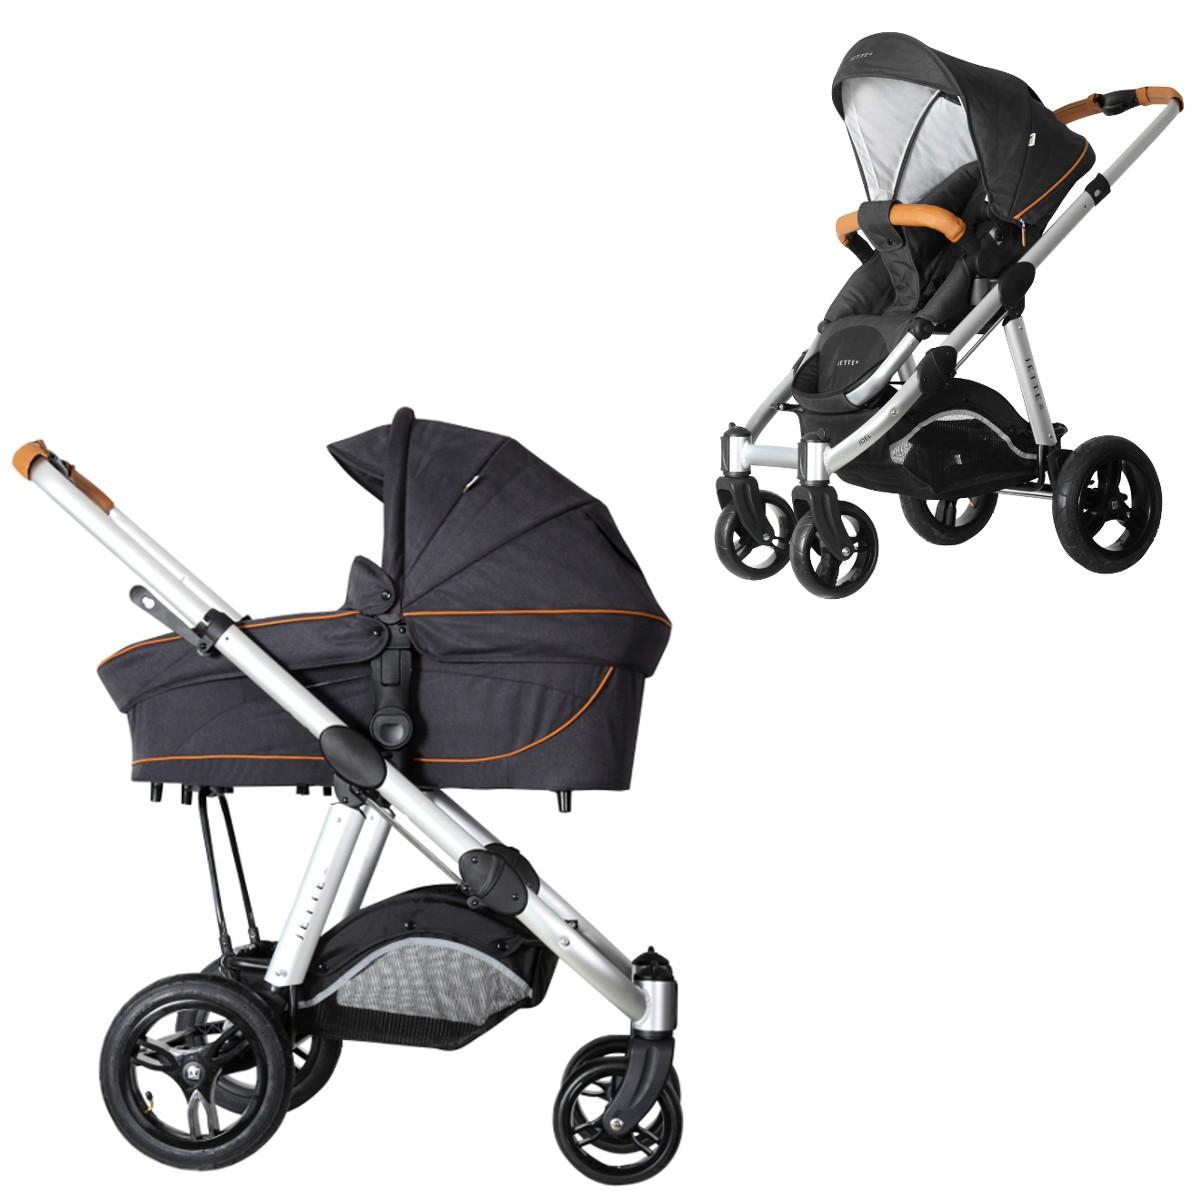 jette joel air kombi kinderwagen 2in1 mit babywanne. Black Bedroom Furniture Sets. Home Design Ideas